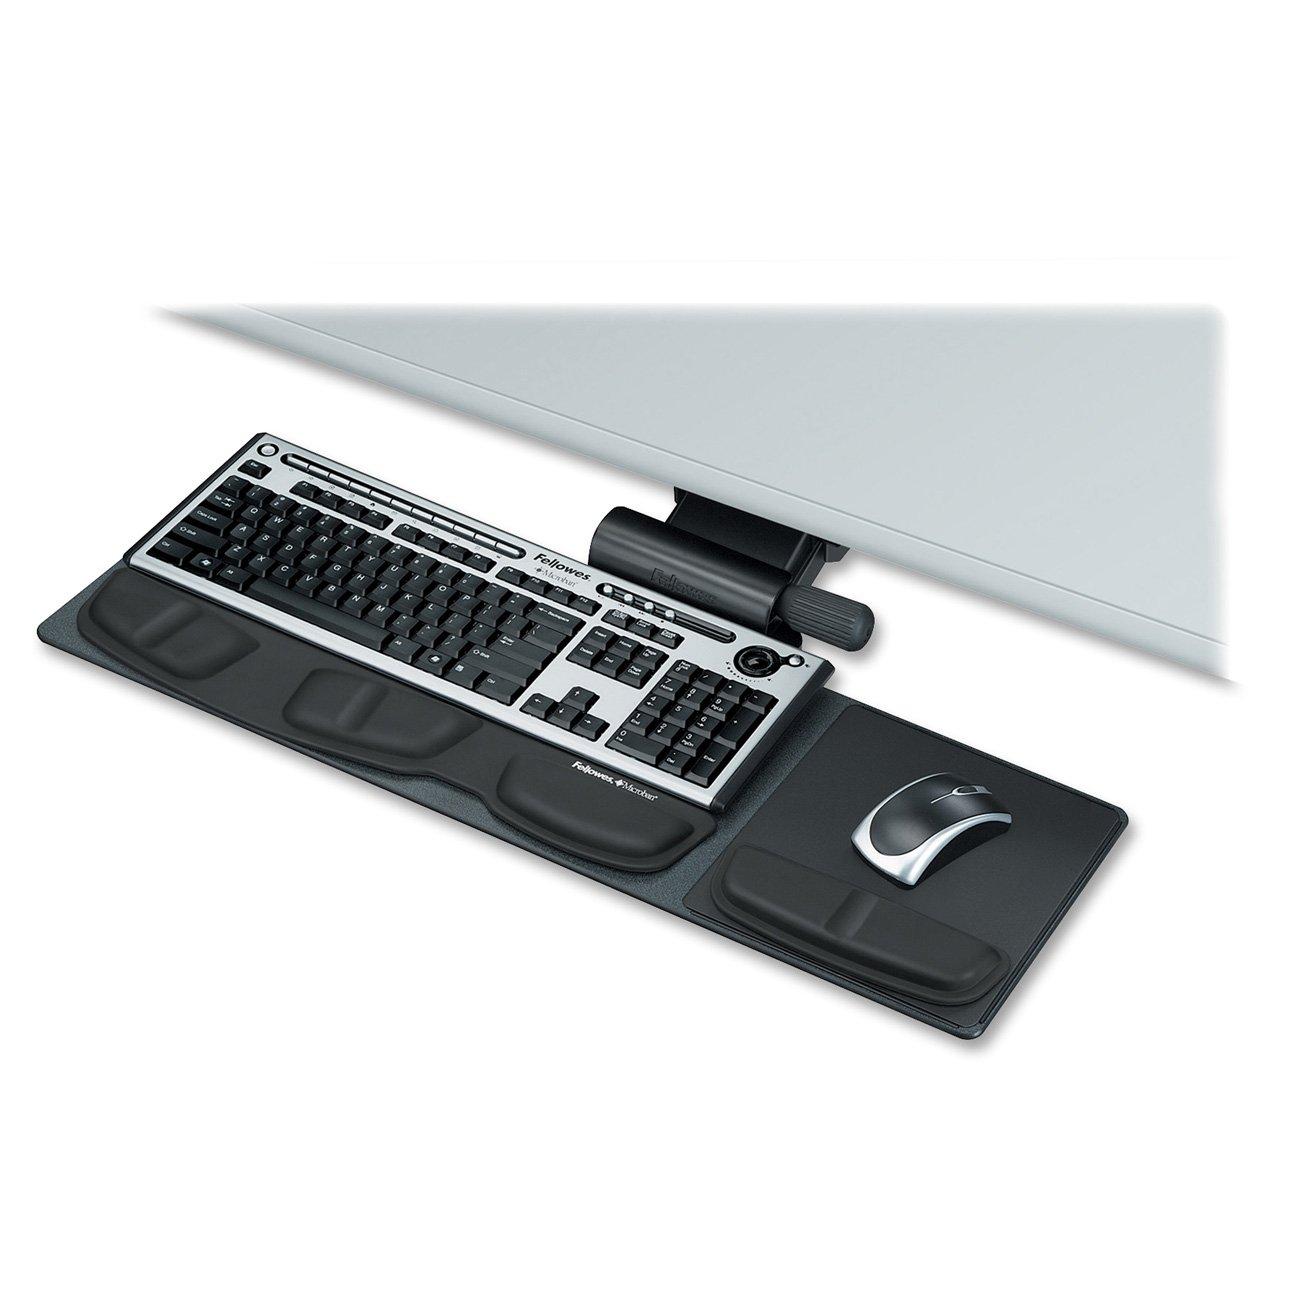 Keyboard Tray 8018001